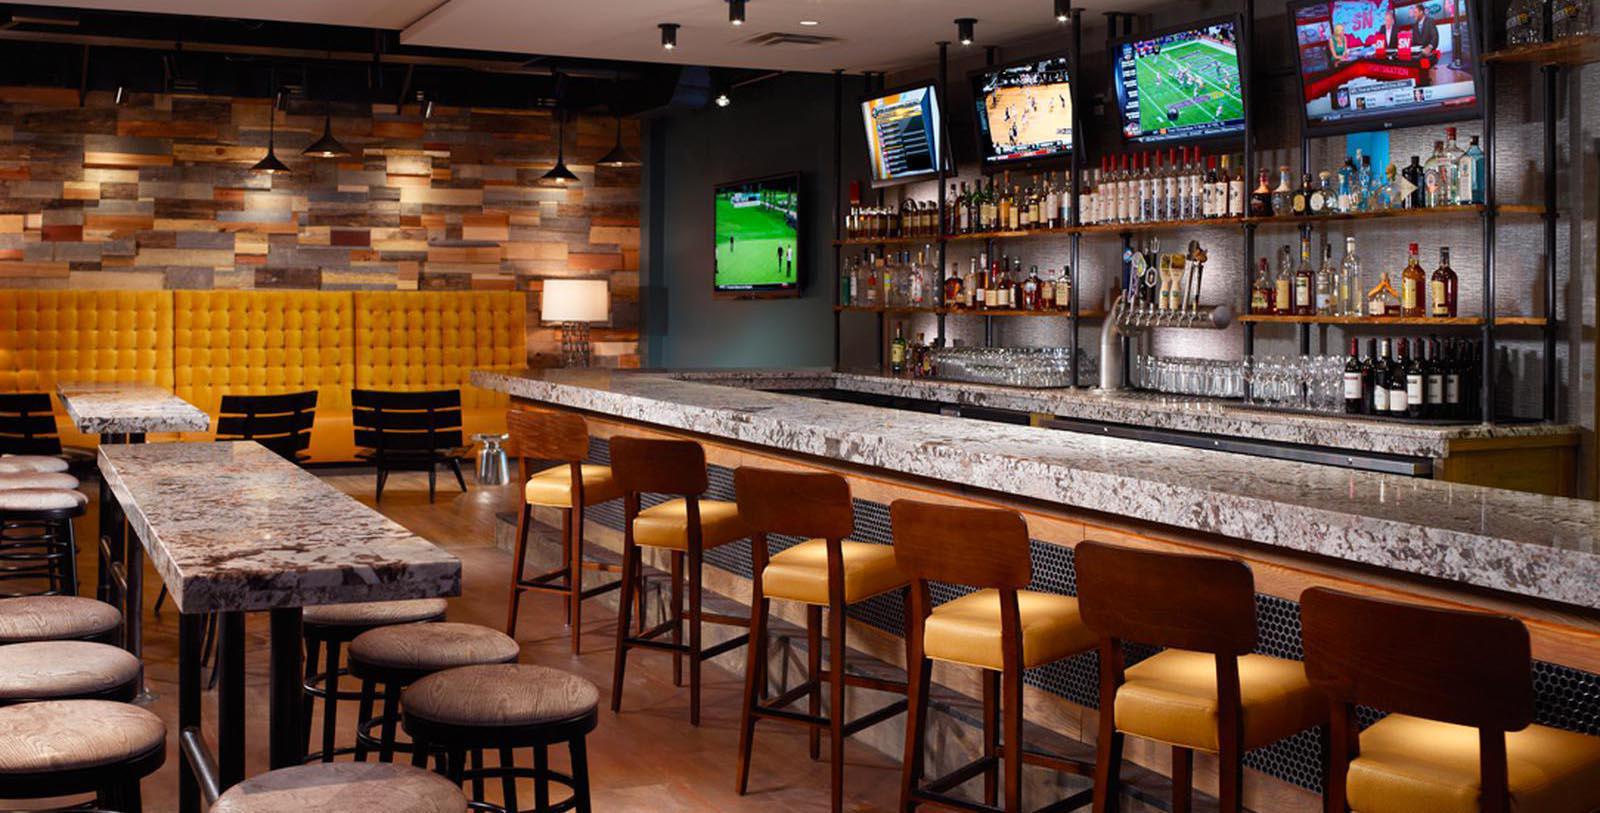 Image of Severin Bar, Omni Severin Hotel, Indianapolis, Indiana, 1913, Member of Historic Hotels of America, Taste